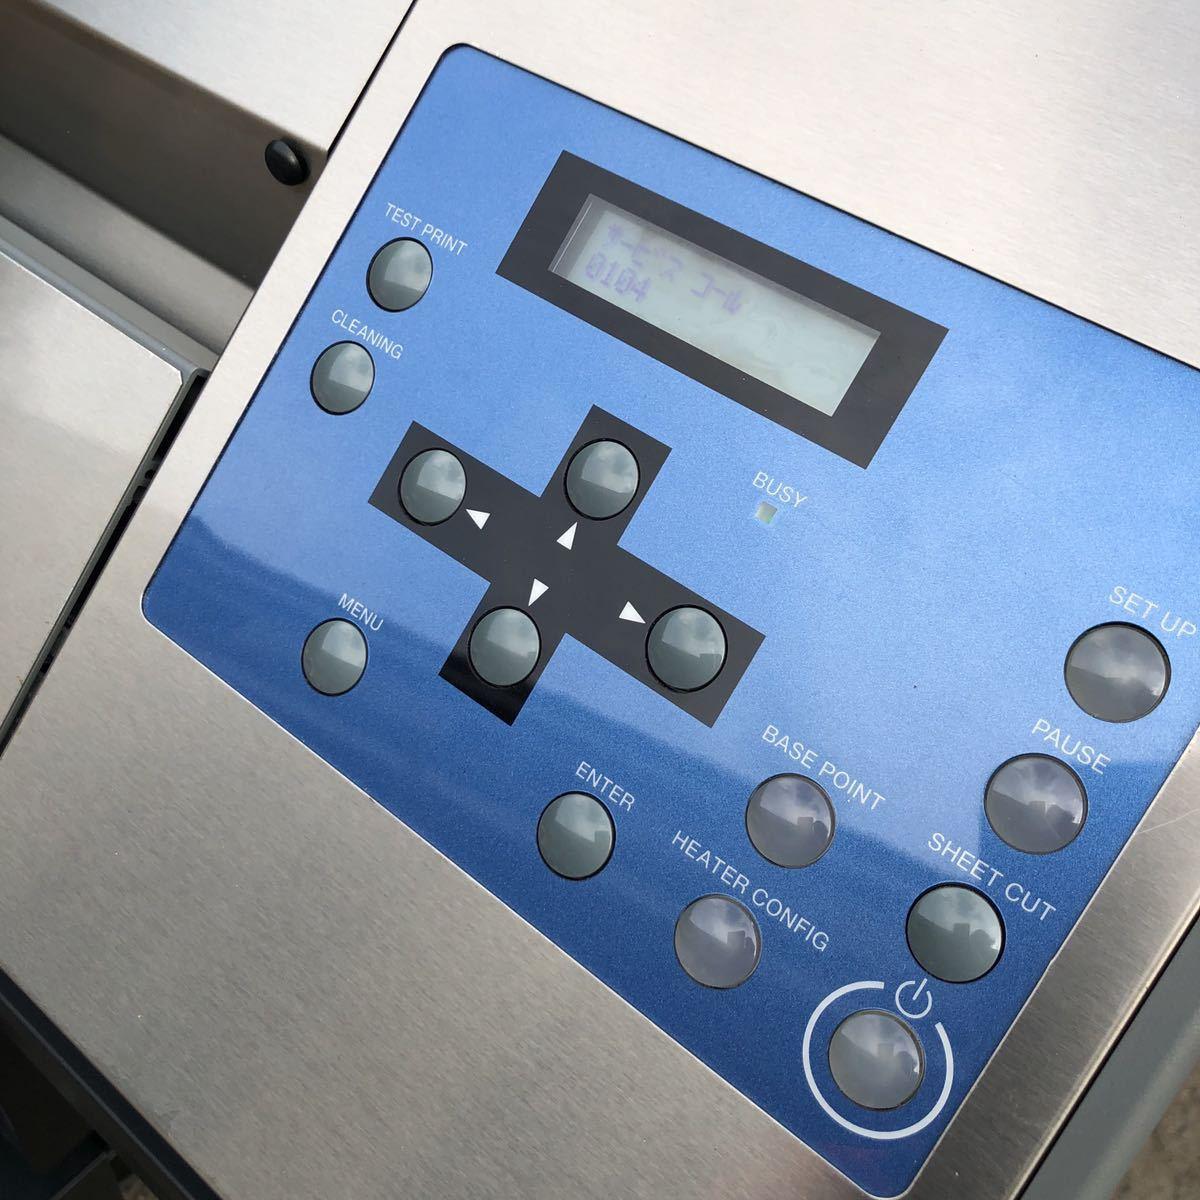 Roland 大型インクジェットプリンター SOLJET PROIII XJ-640 ローランド 壁紙 大判印刷 プロッタ 日本製 定価357万円 通電OK 現状品_画像3